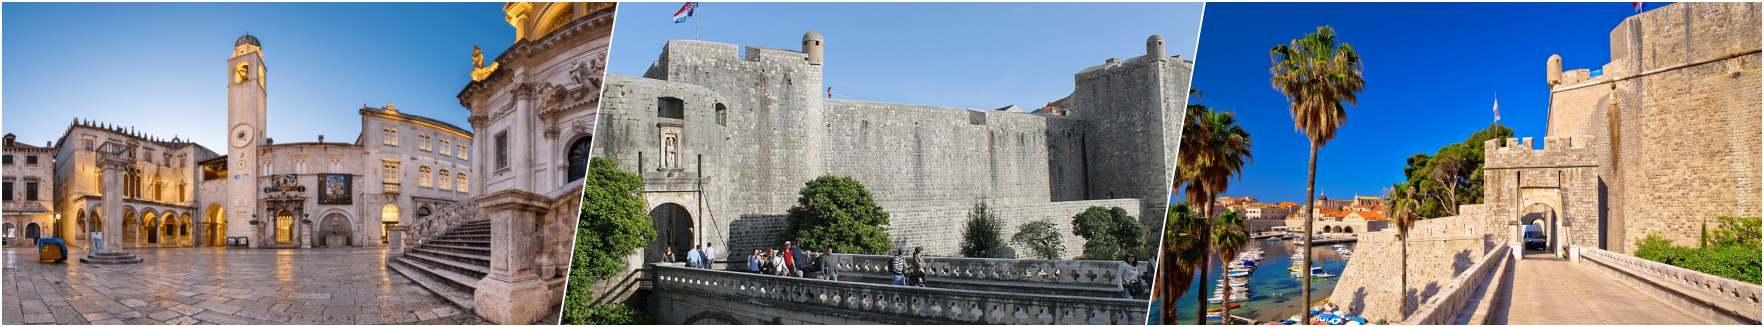 Sponza Palace - Pile Gate - Ploce Gate